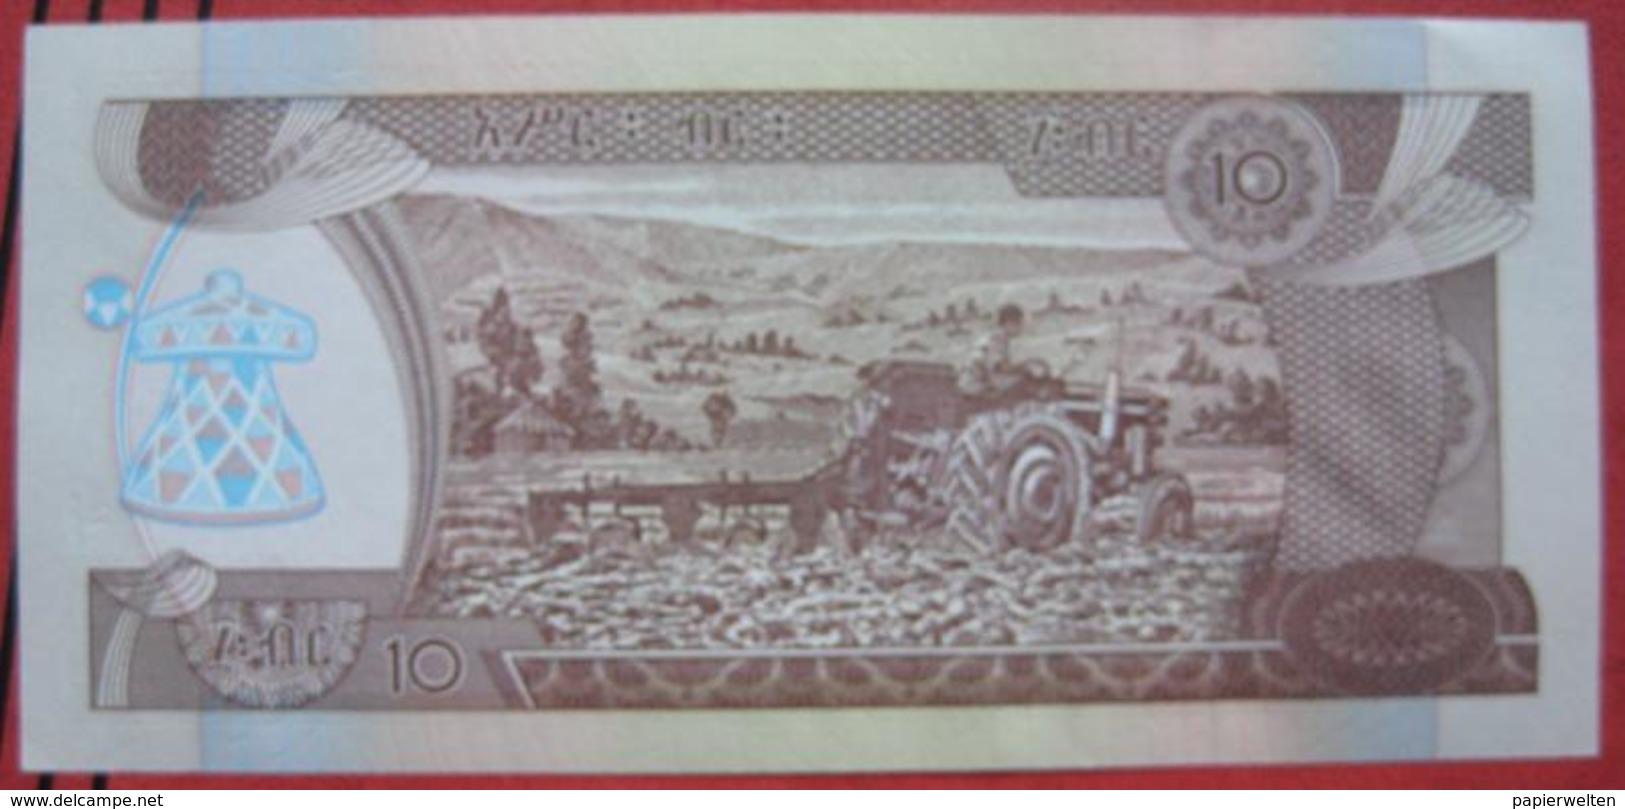 Ten / 10 Birr 2008 (WPM 48e) - Ethiopie